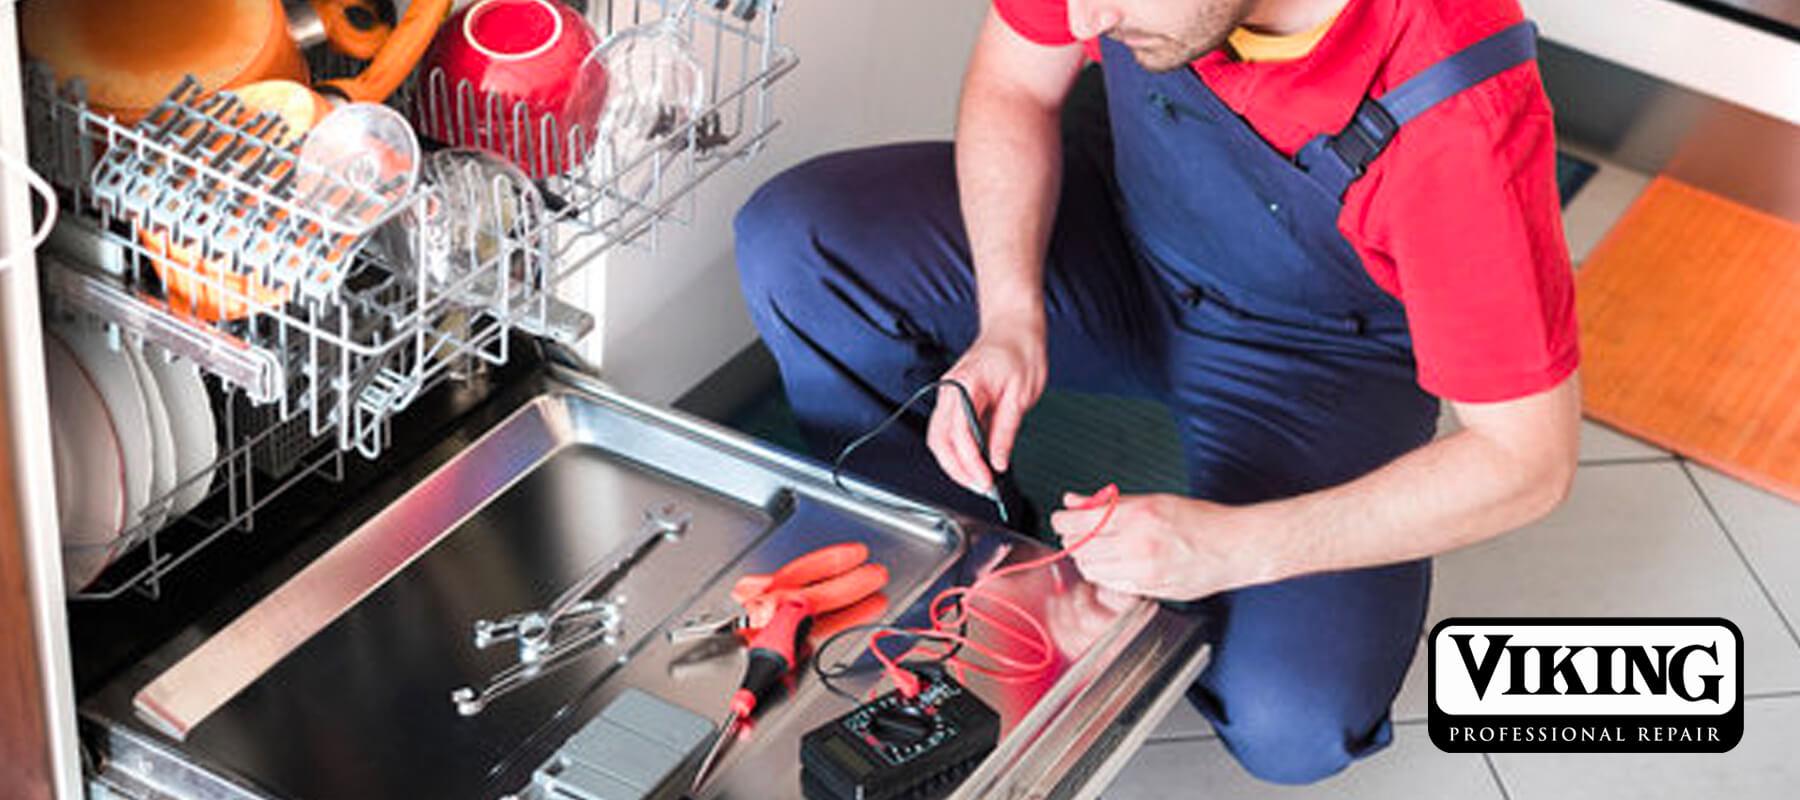 Authorized Viking Appliance Repair Service Rancho Santa Fe | Professional Viking Repair